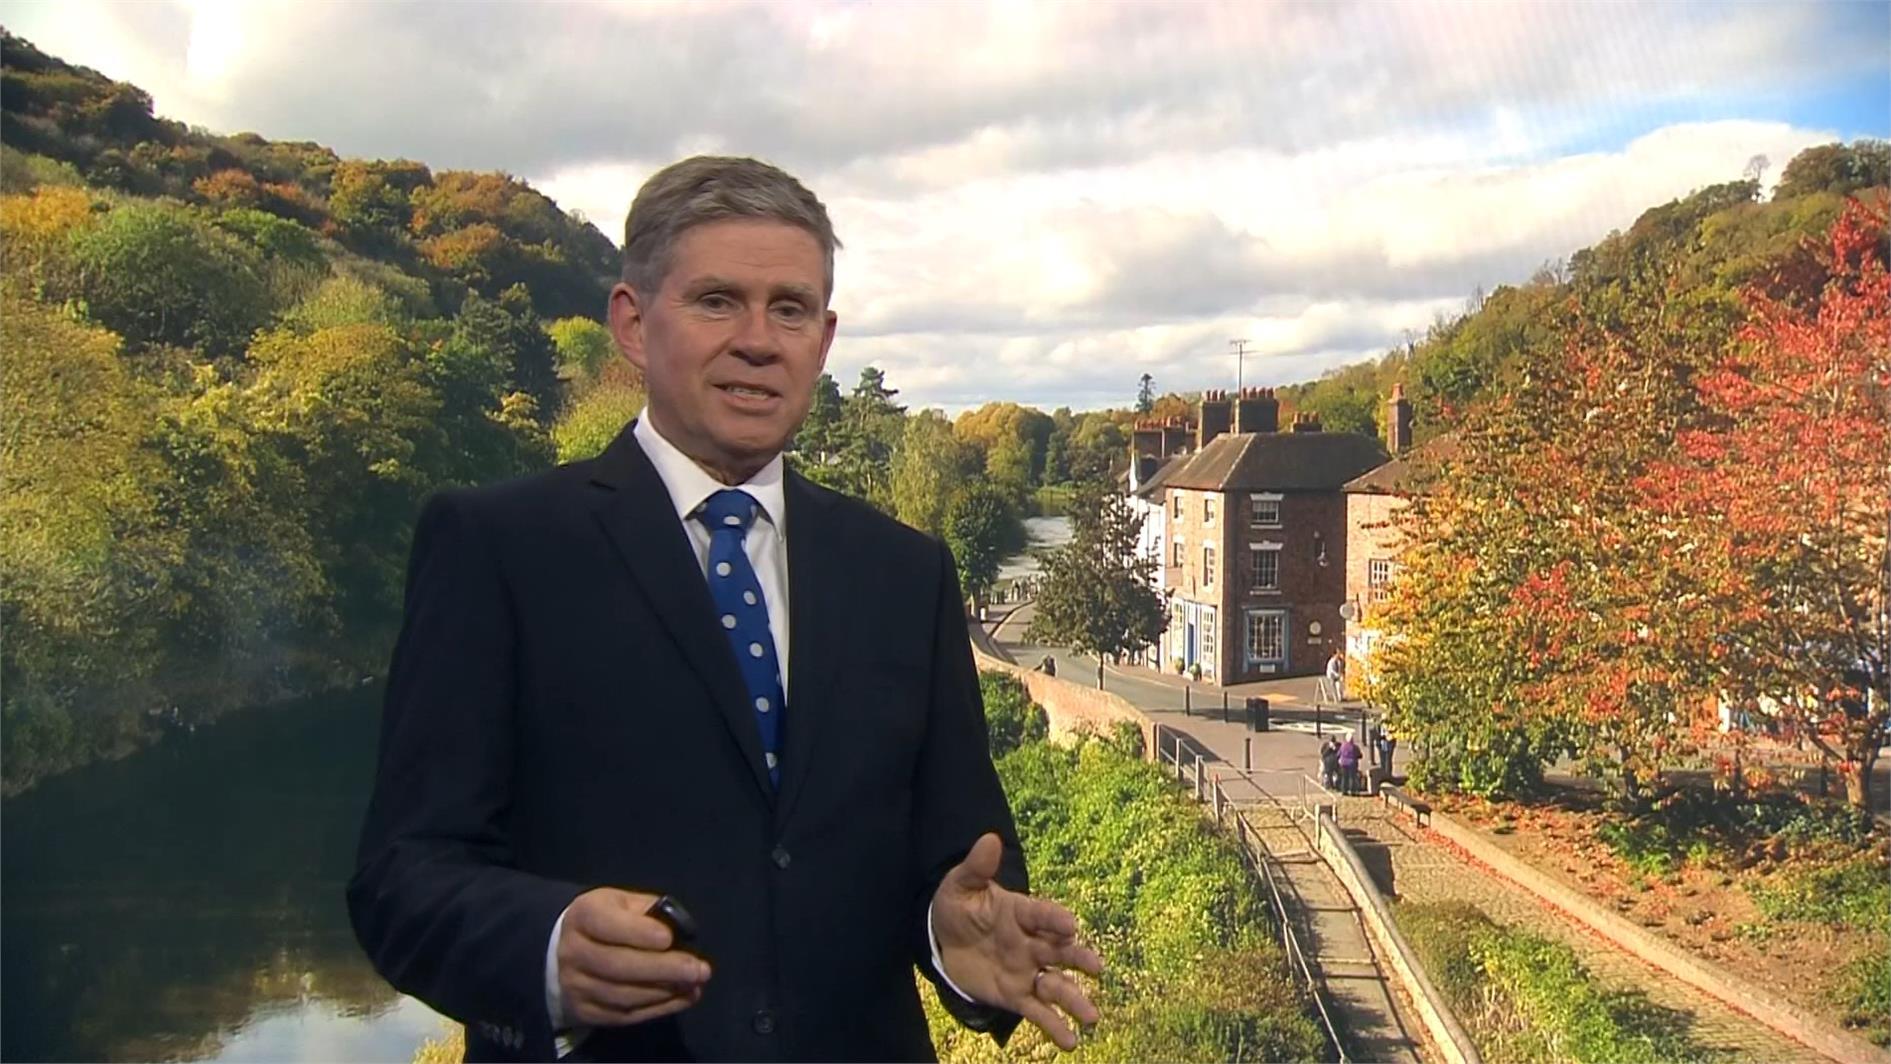 Philip Avery - BBC Weather Presenter (4)